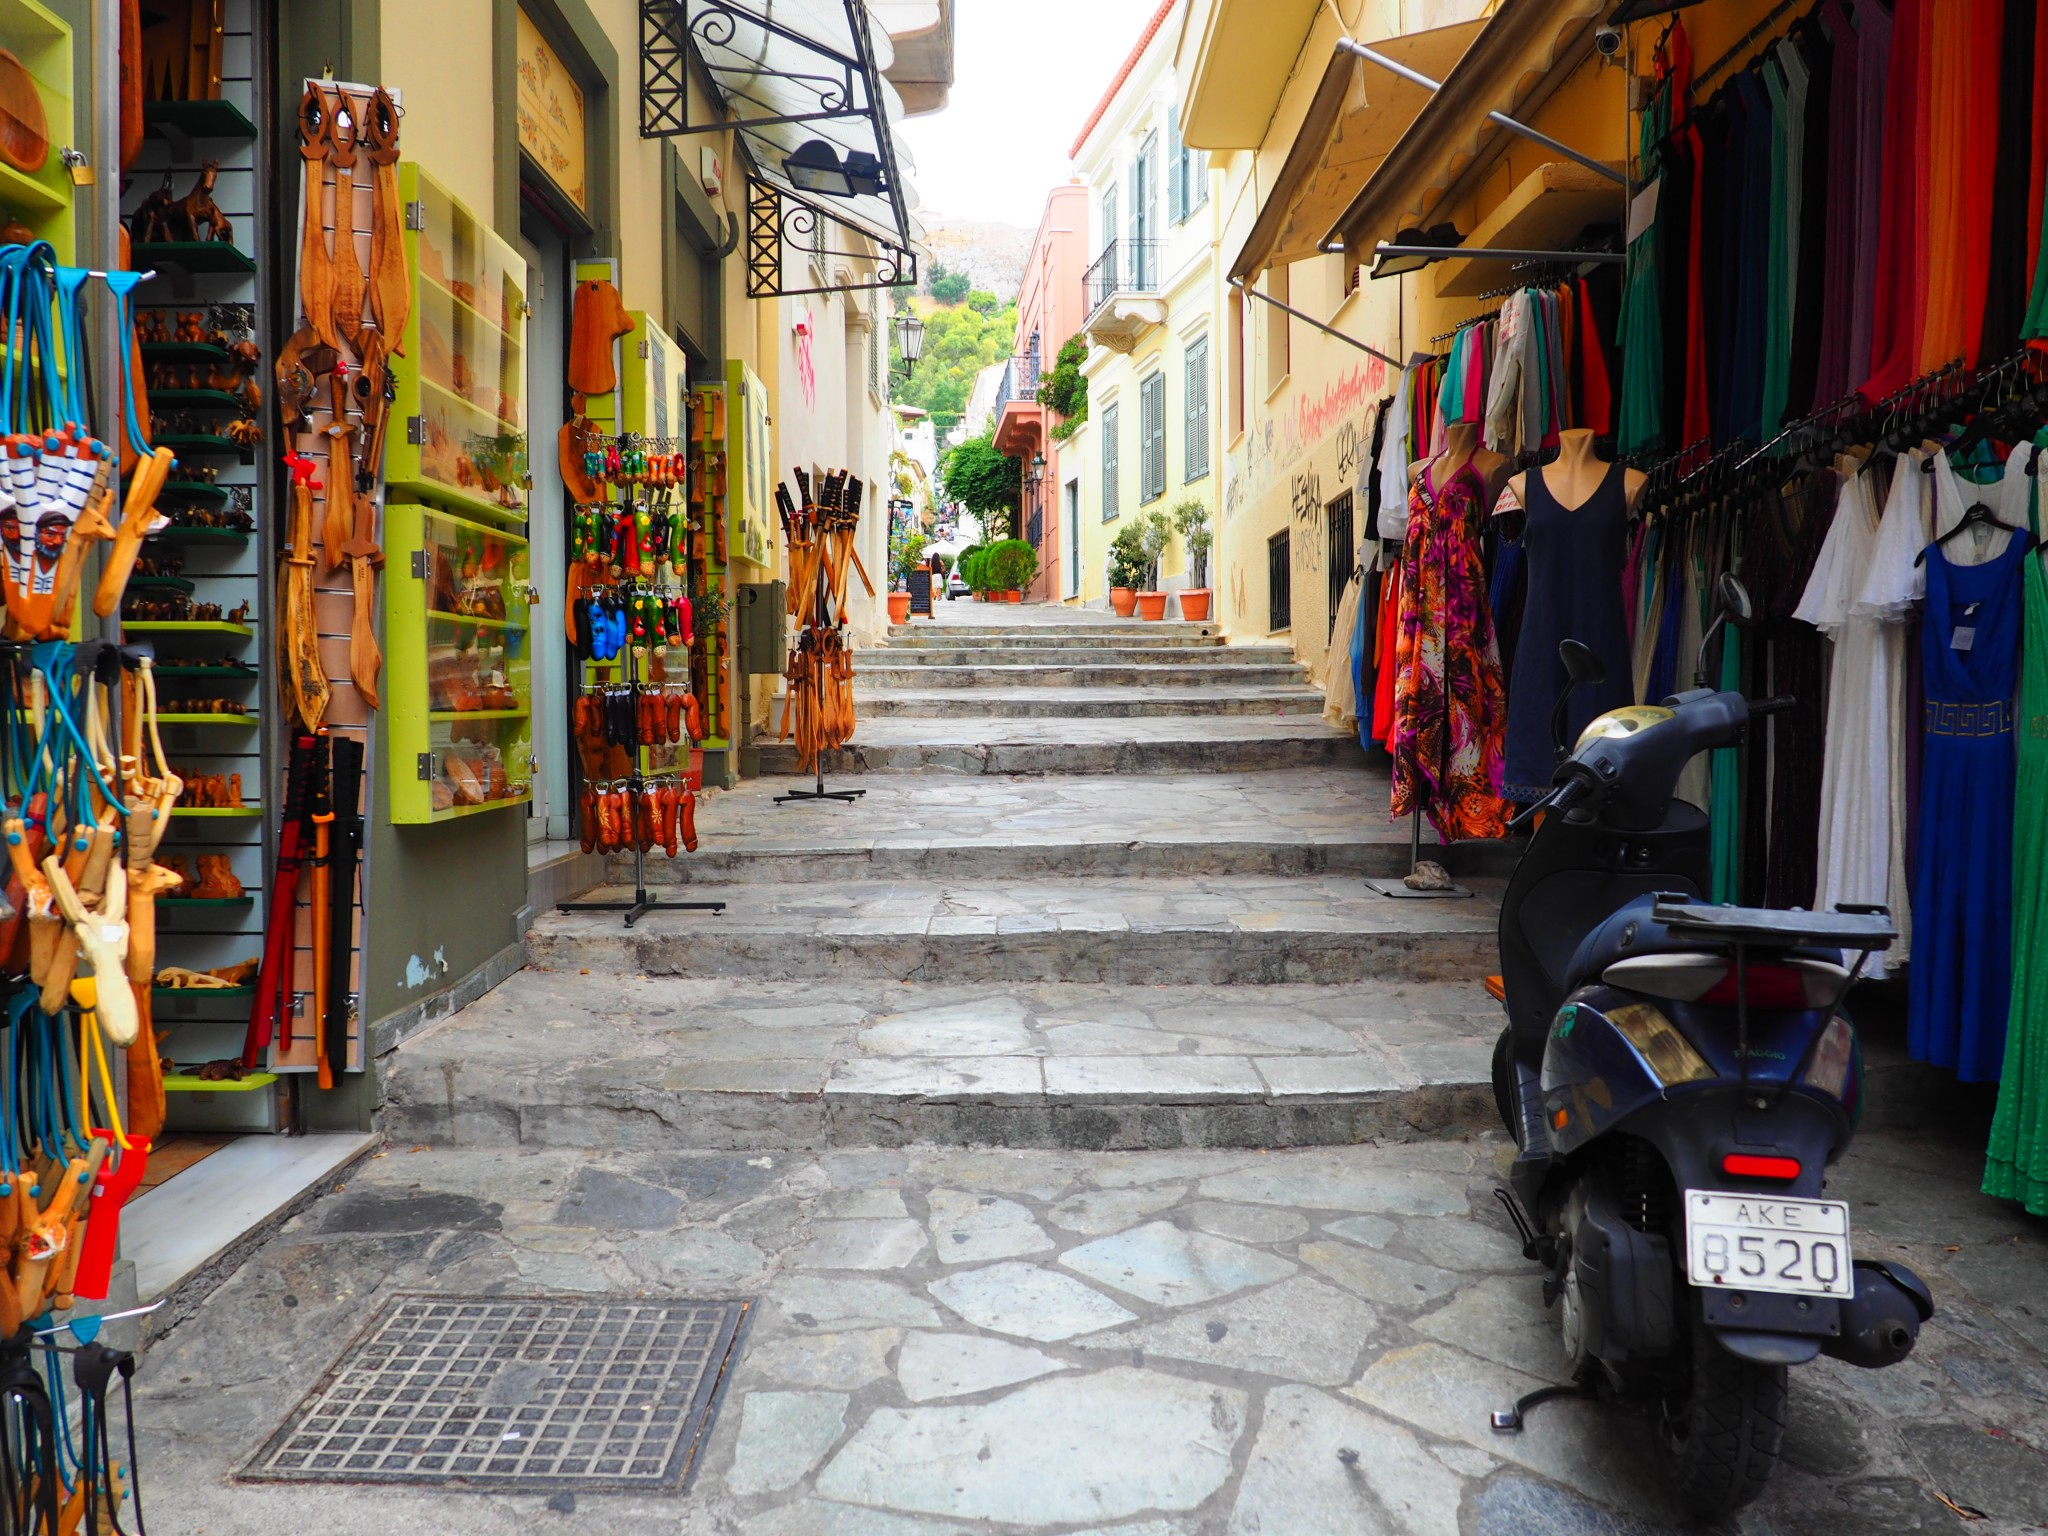 Athens Travel Guide letsregale.com 6